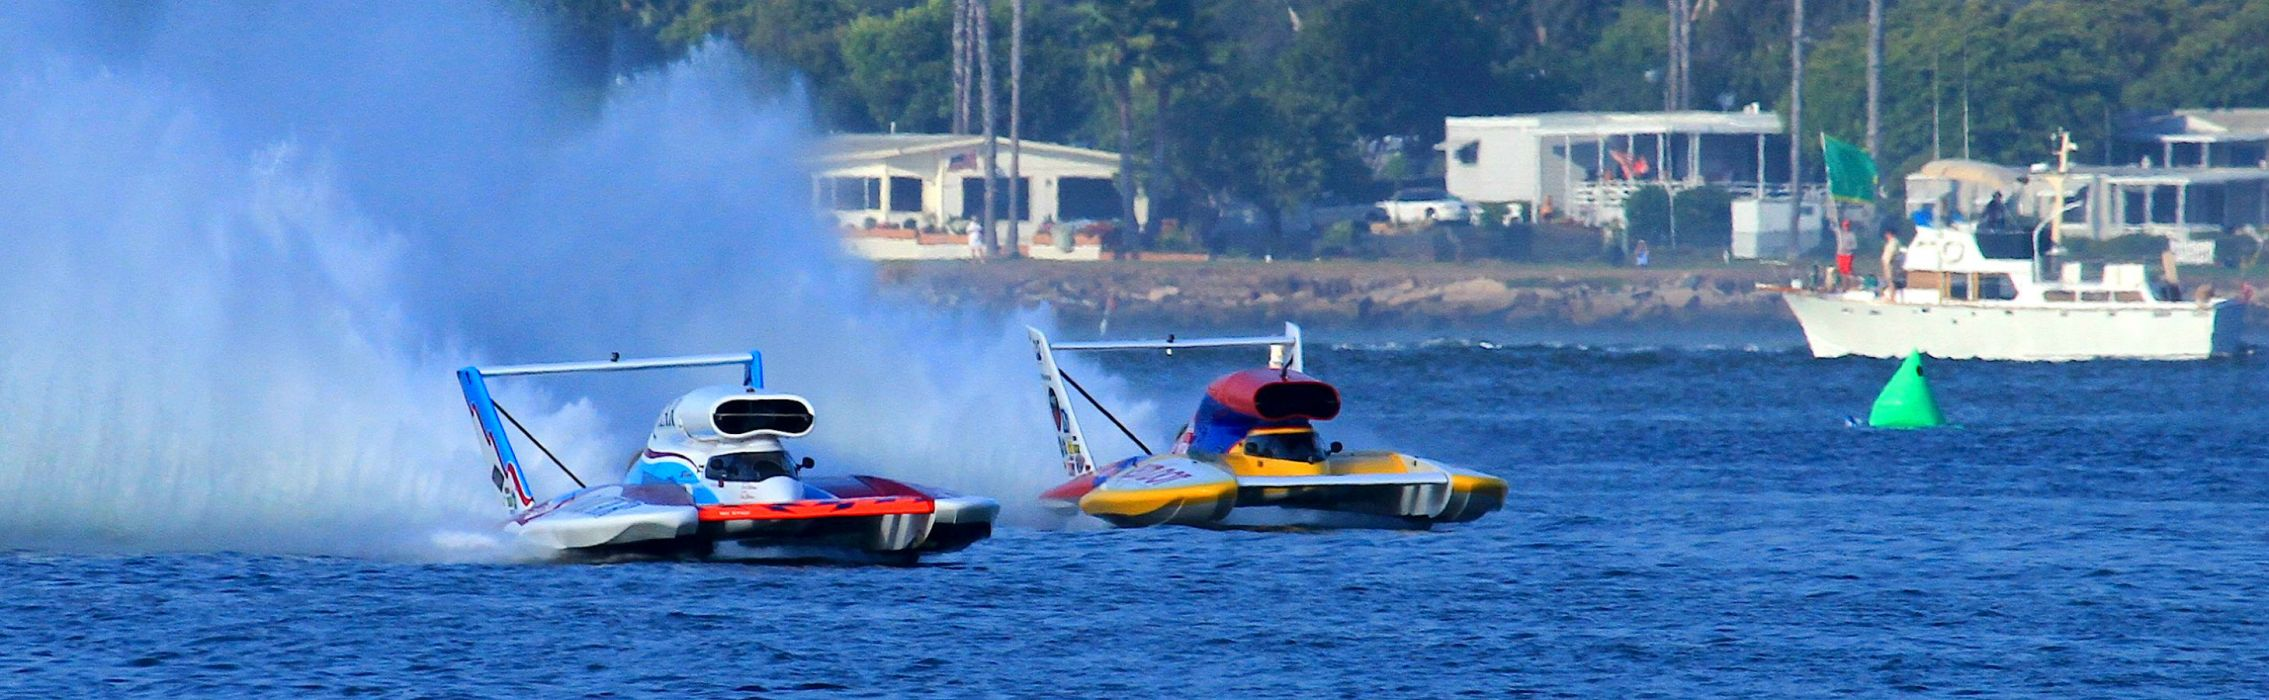 UNLIMITED-HYDROPLANE race racing jet hydroplane boat ship hot rod rods   te wallpaper